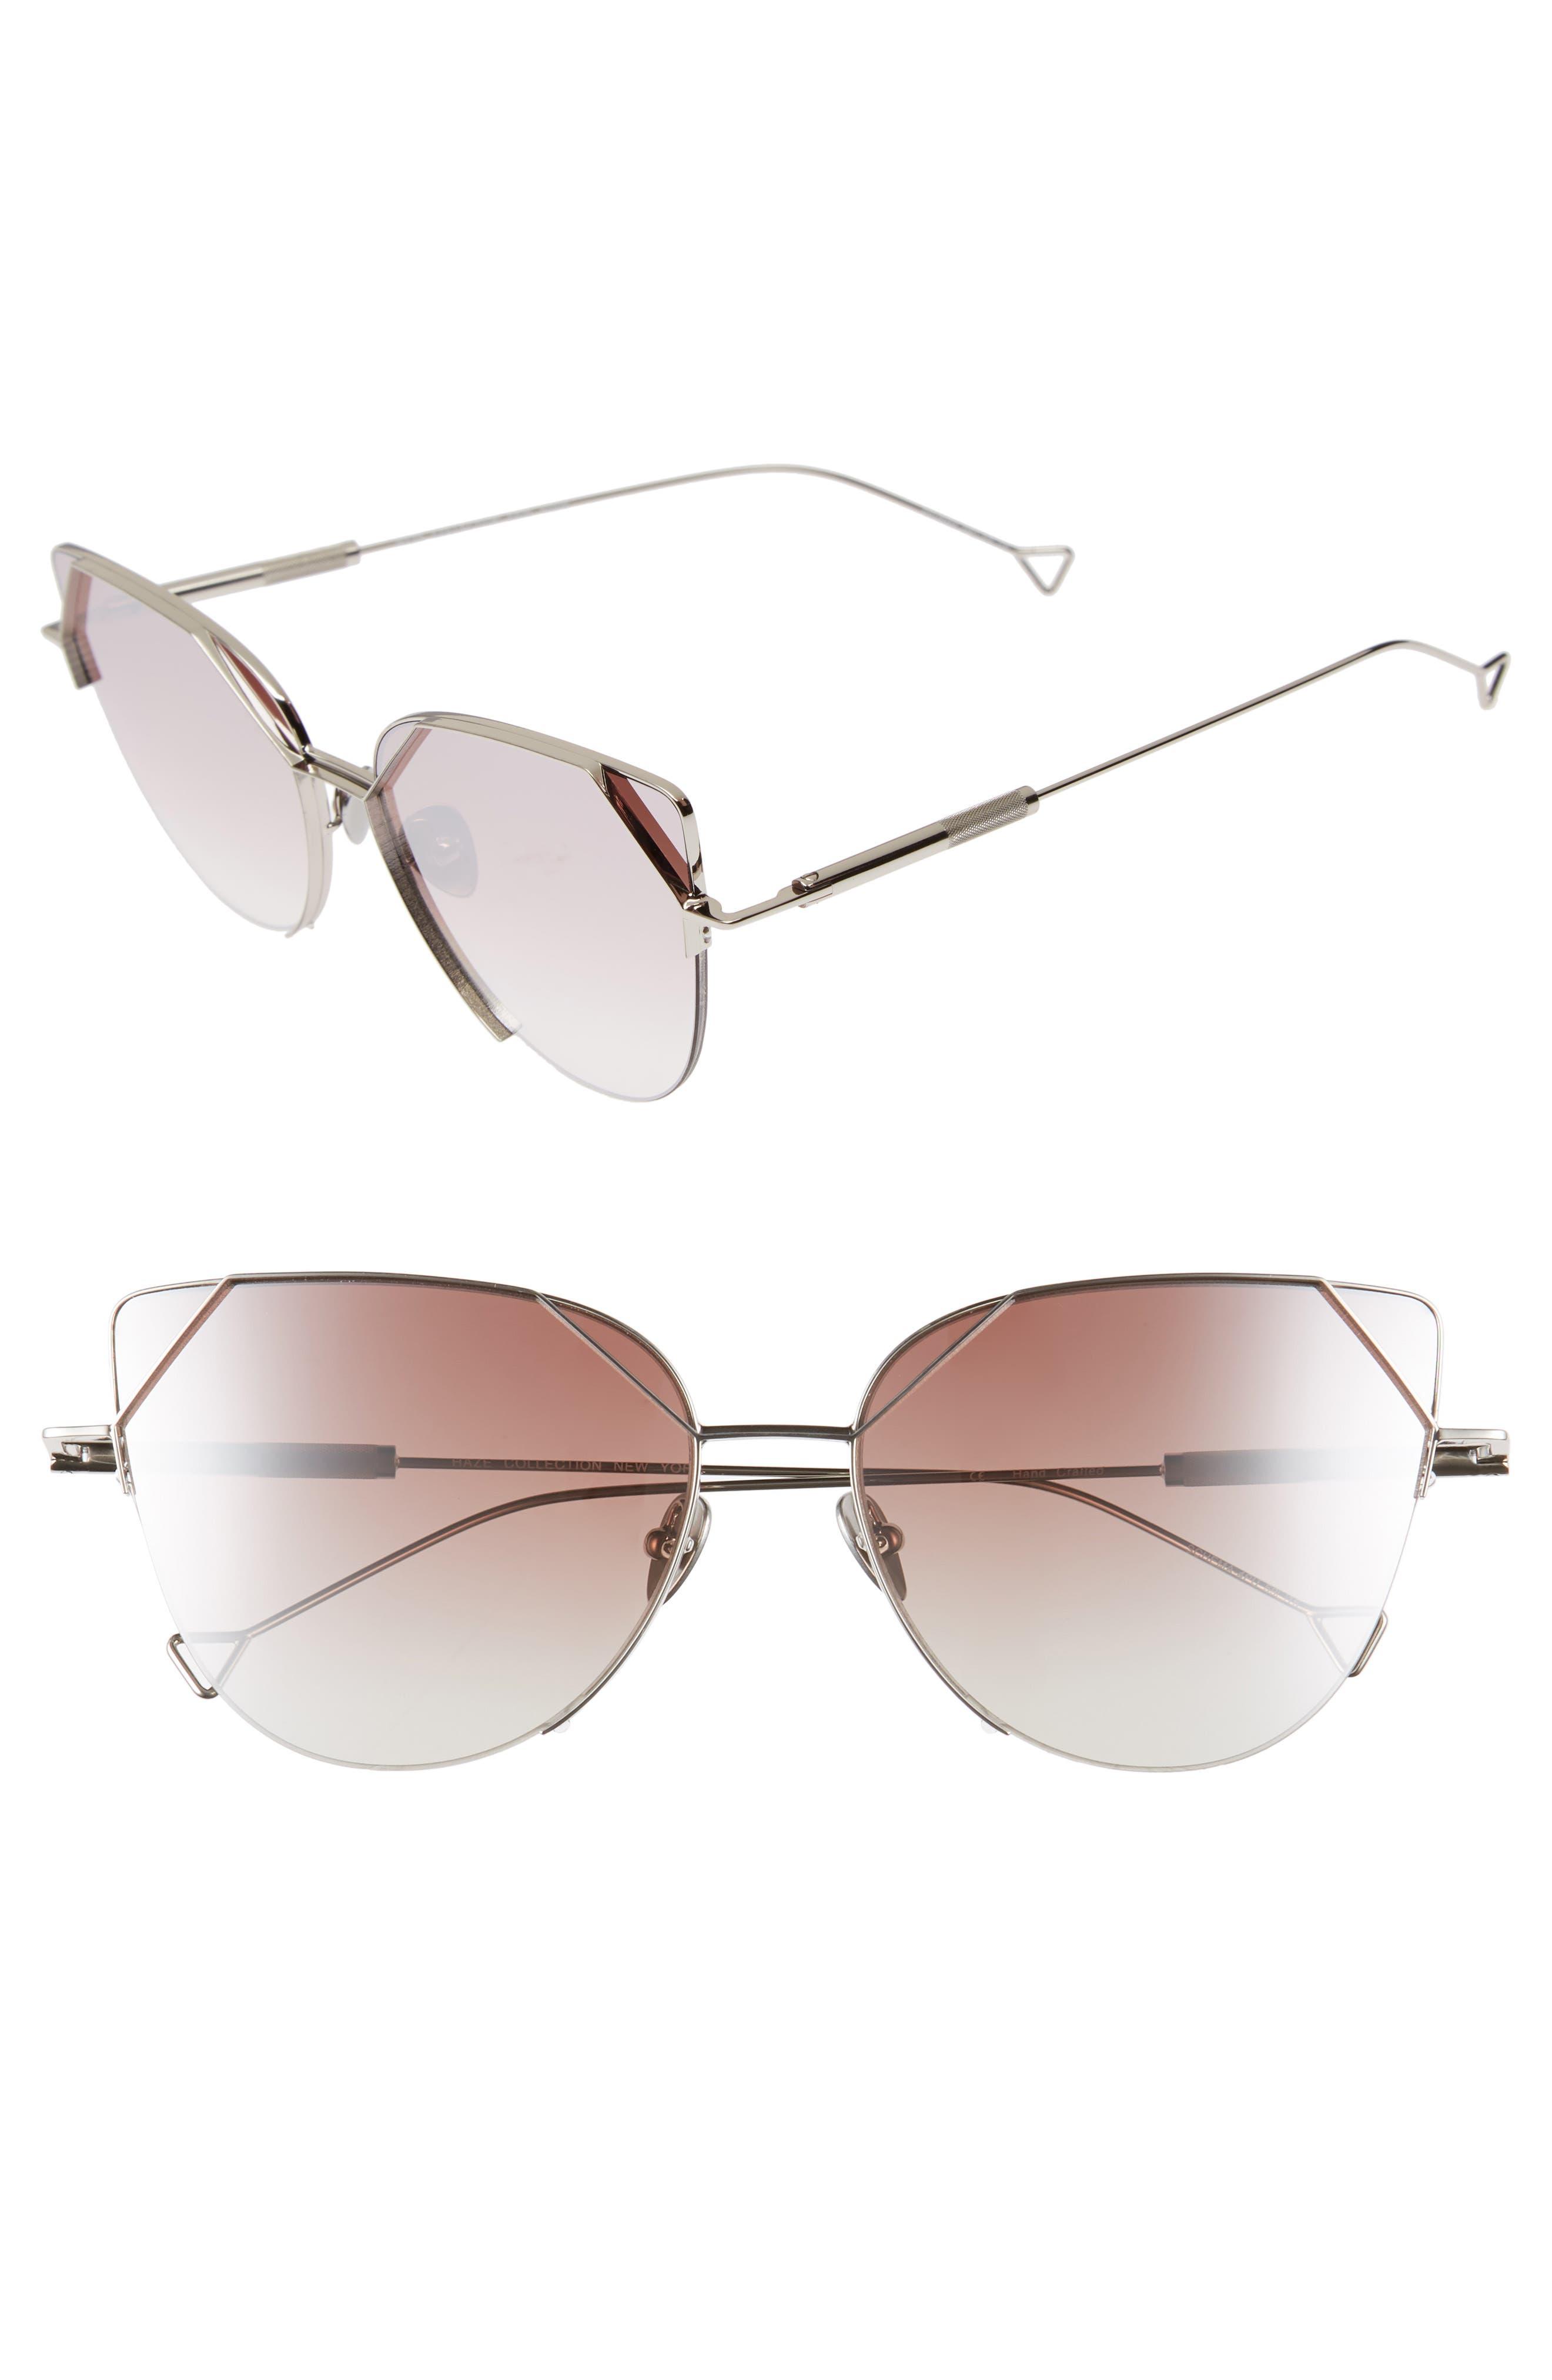 HAZE The Schema 59mm Cat Eye Sunglasses